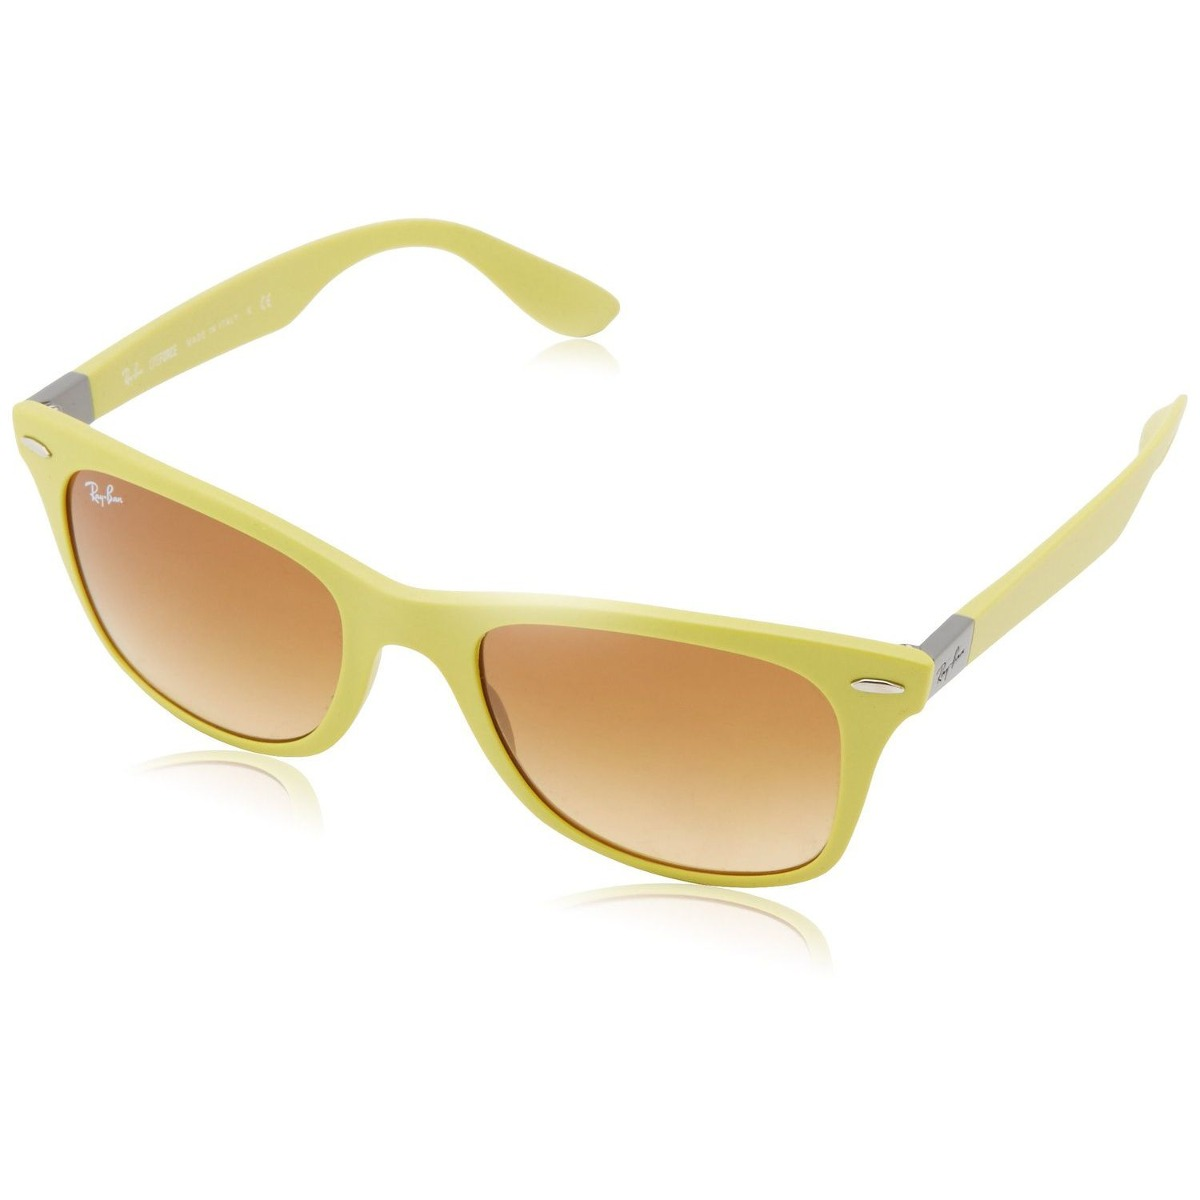 5263813f022 ... reduced gafas ray ban wayfarer liteforce. cargando zoom. e3760 8884b